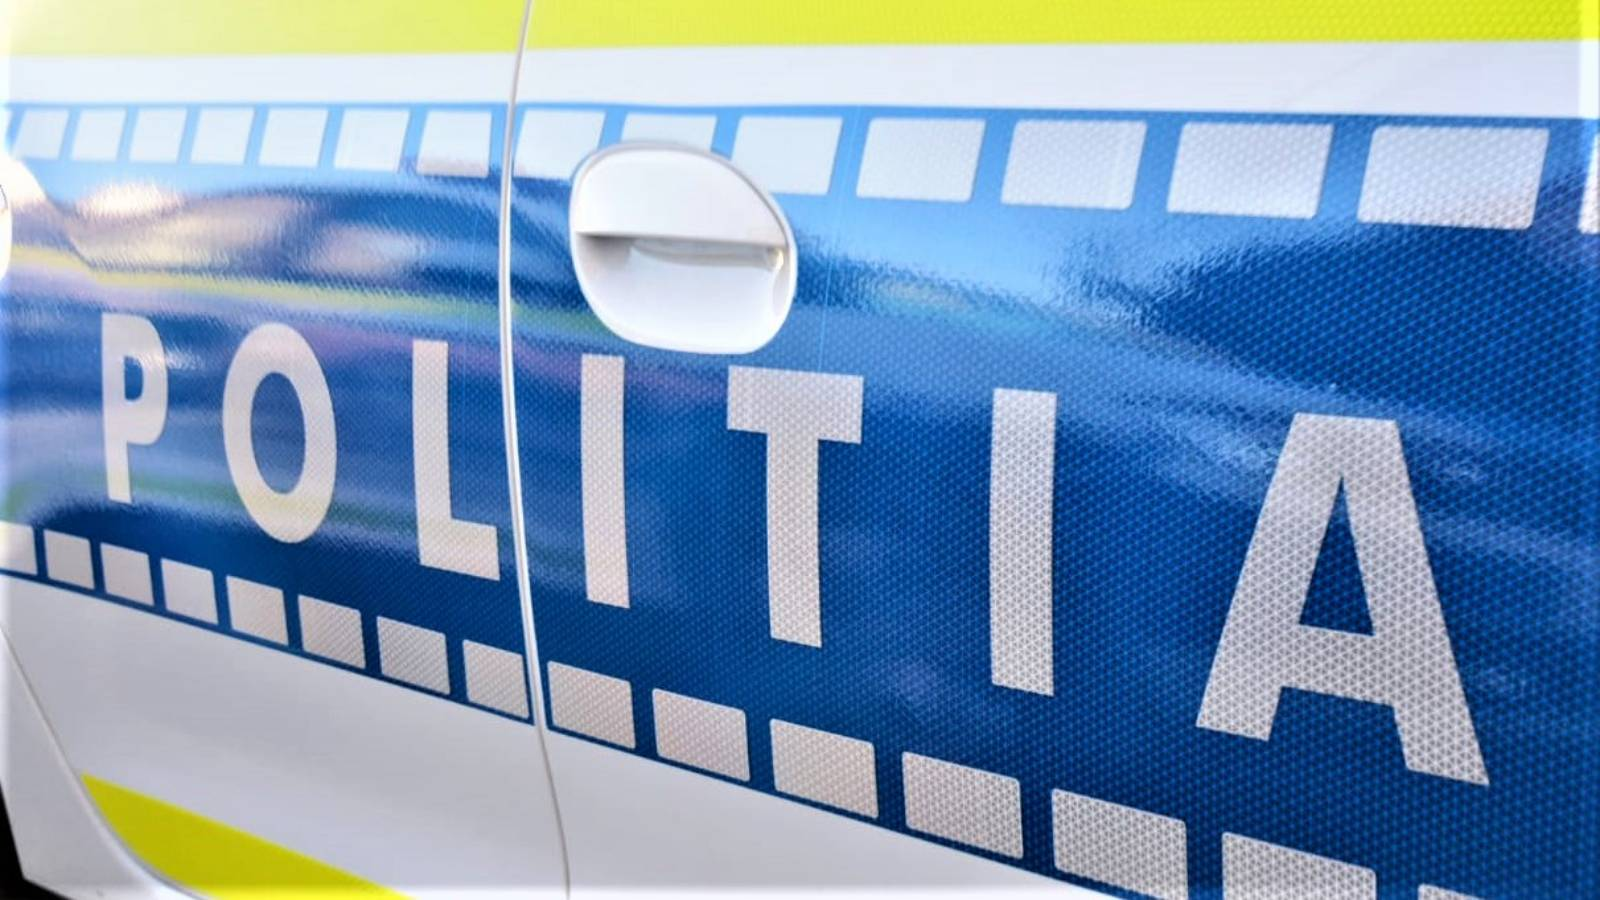 Politia Romana Mesajul prudenta Romani Sarbatori